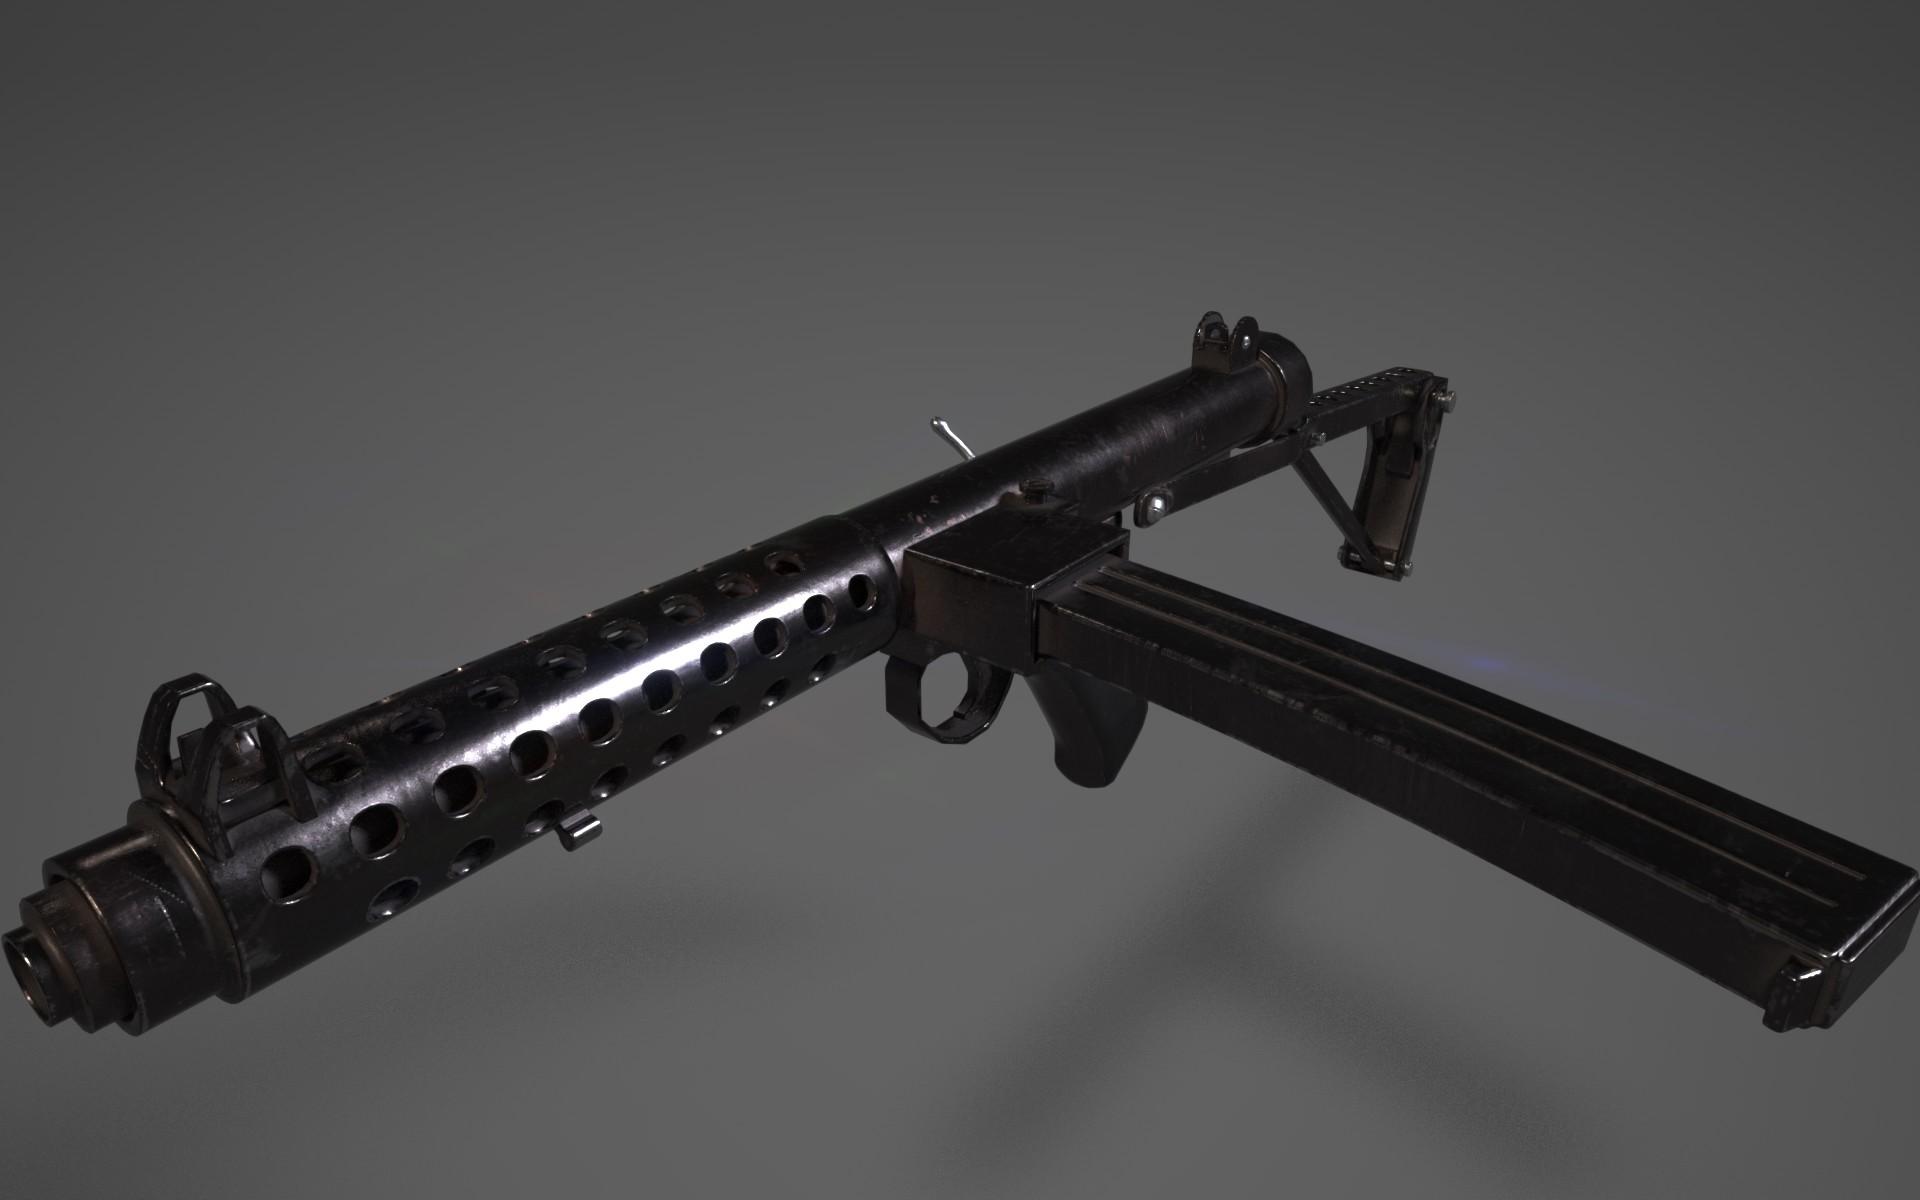 ArtStation - Sterling submachine gun, Joe-Louis Pereira